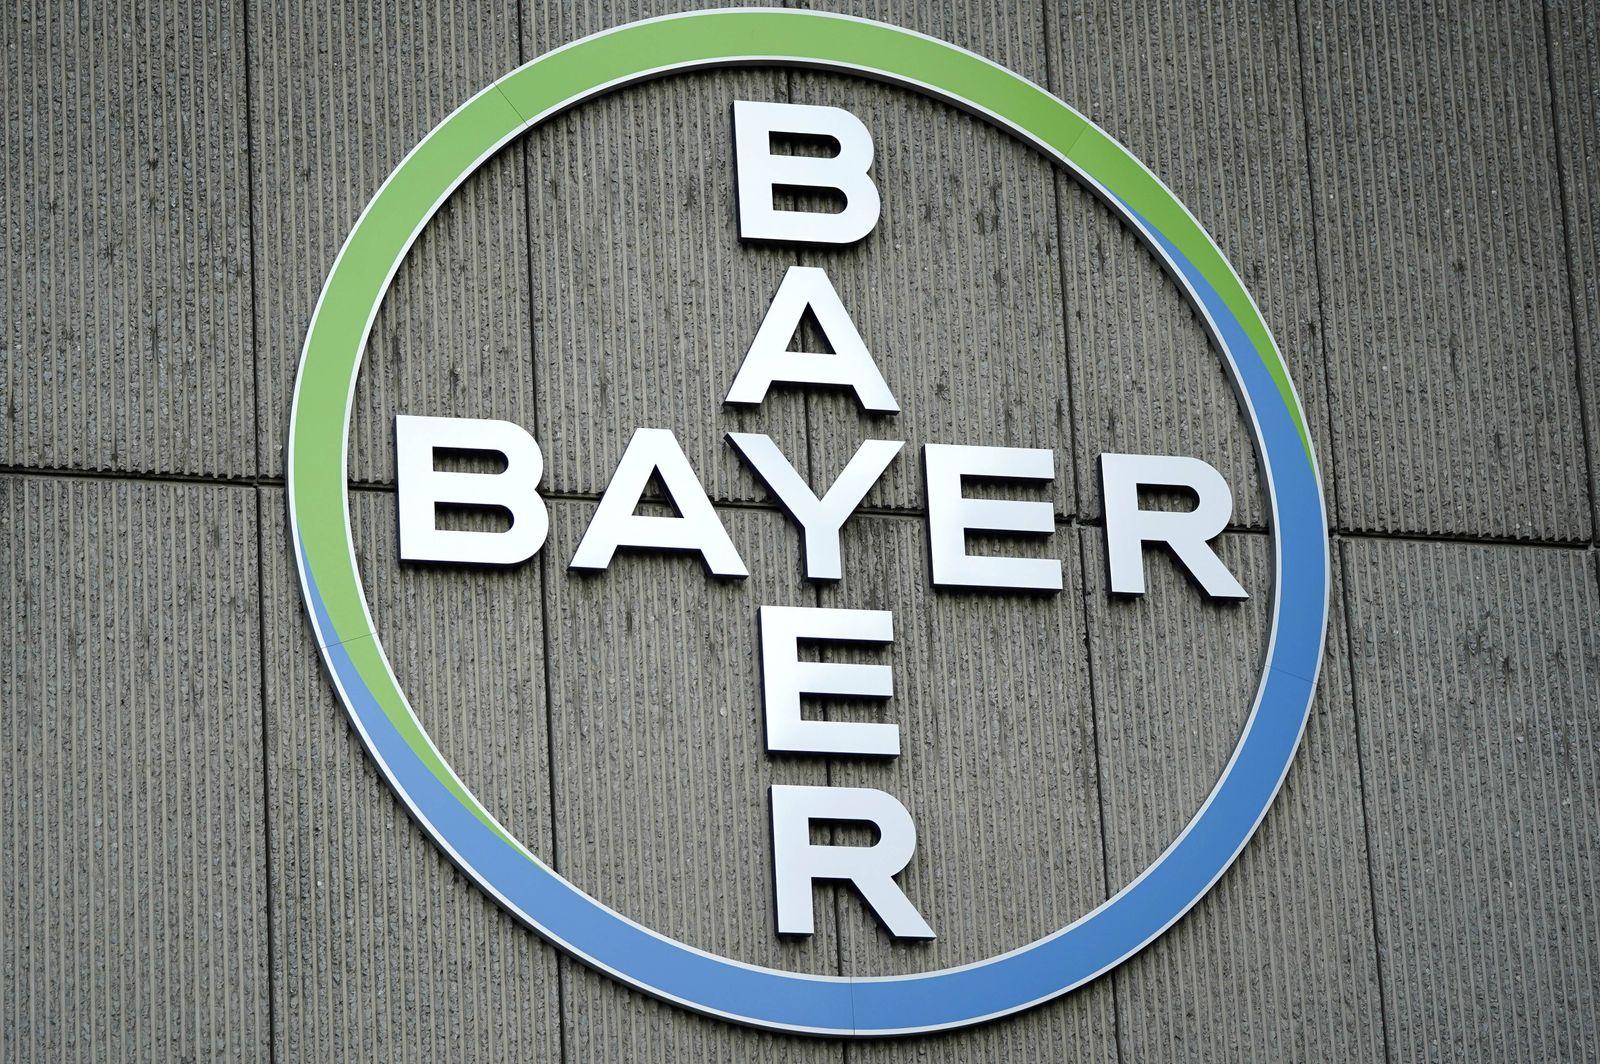 Logo der Firma Bayer. Berlin, 16.09.2019 *** Logo of Bayer Berlin, 16 09 2019 Foto:xJ.xKrickx/xFuturexImage